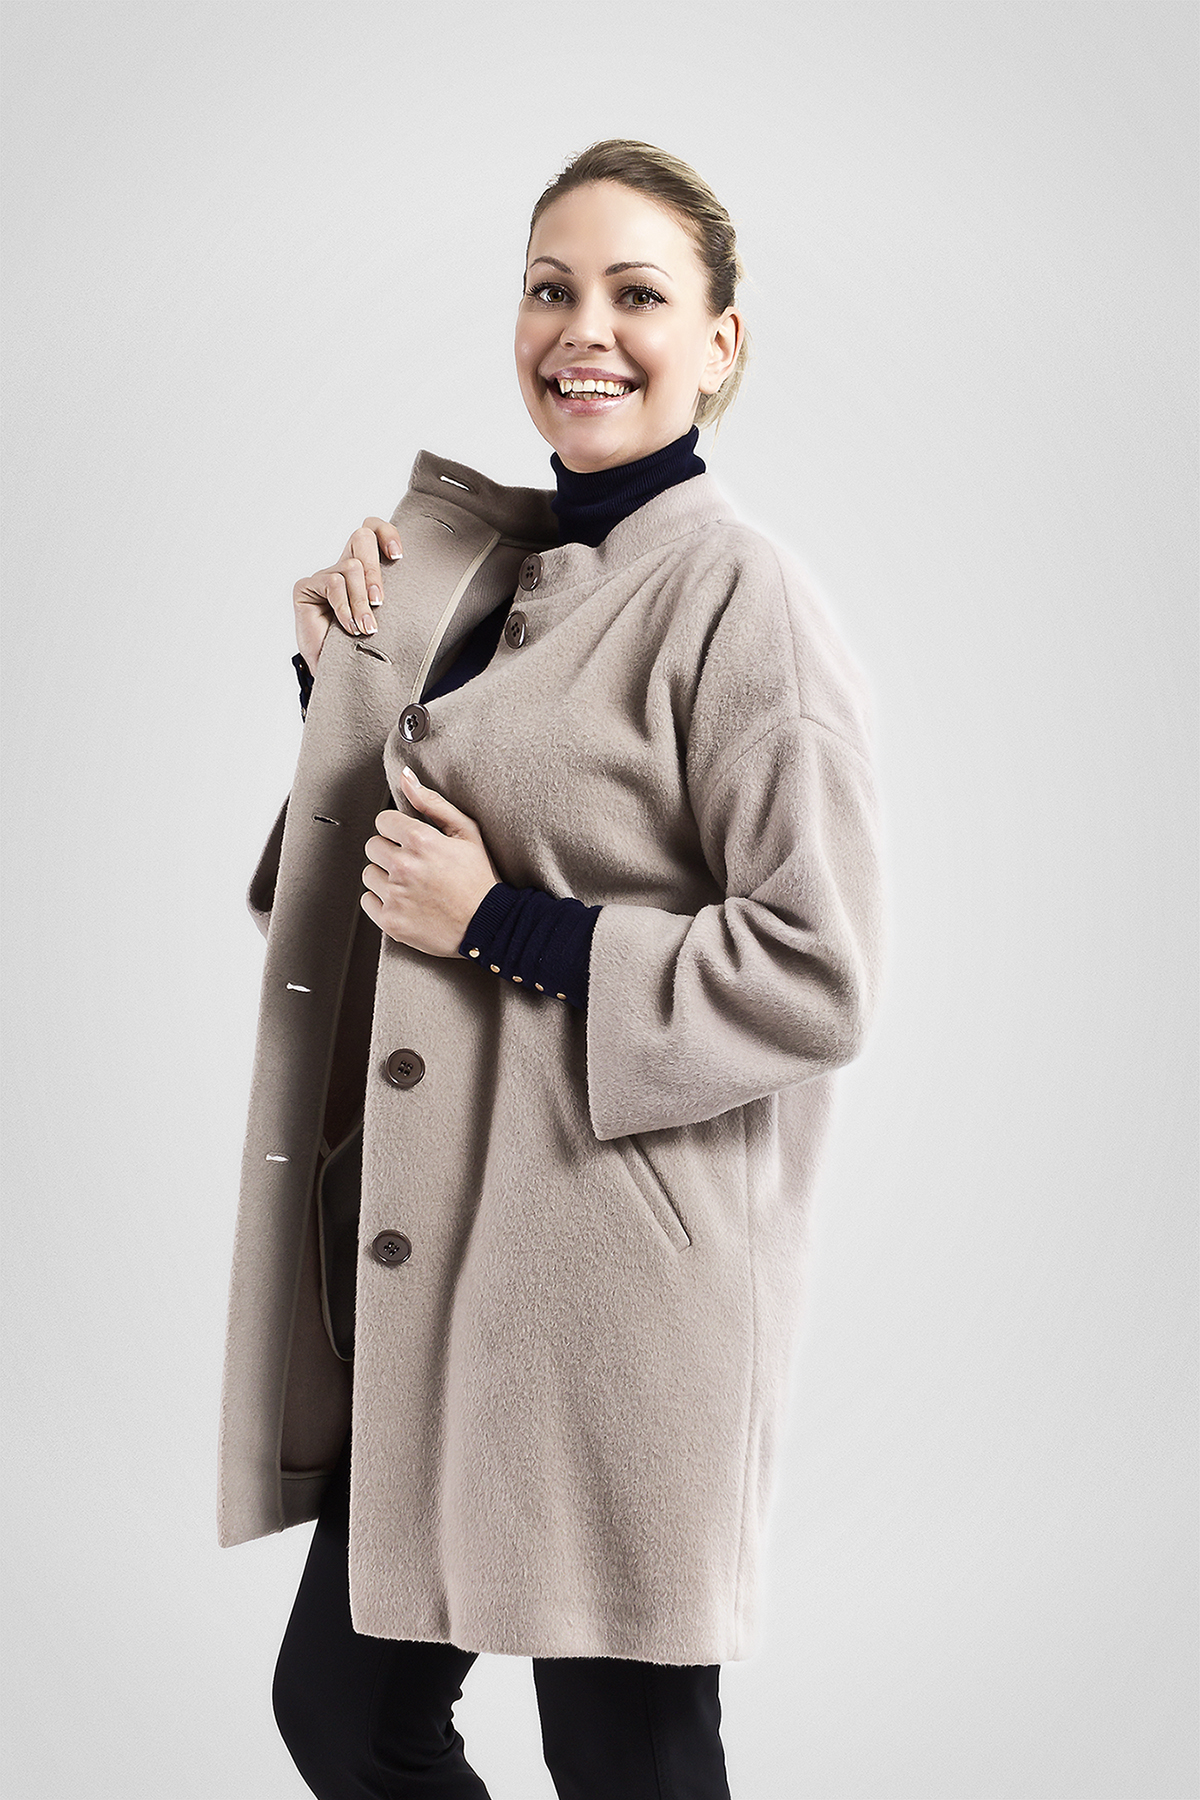 Modekollektion Valentina Kopp